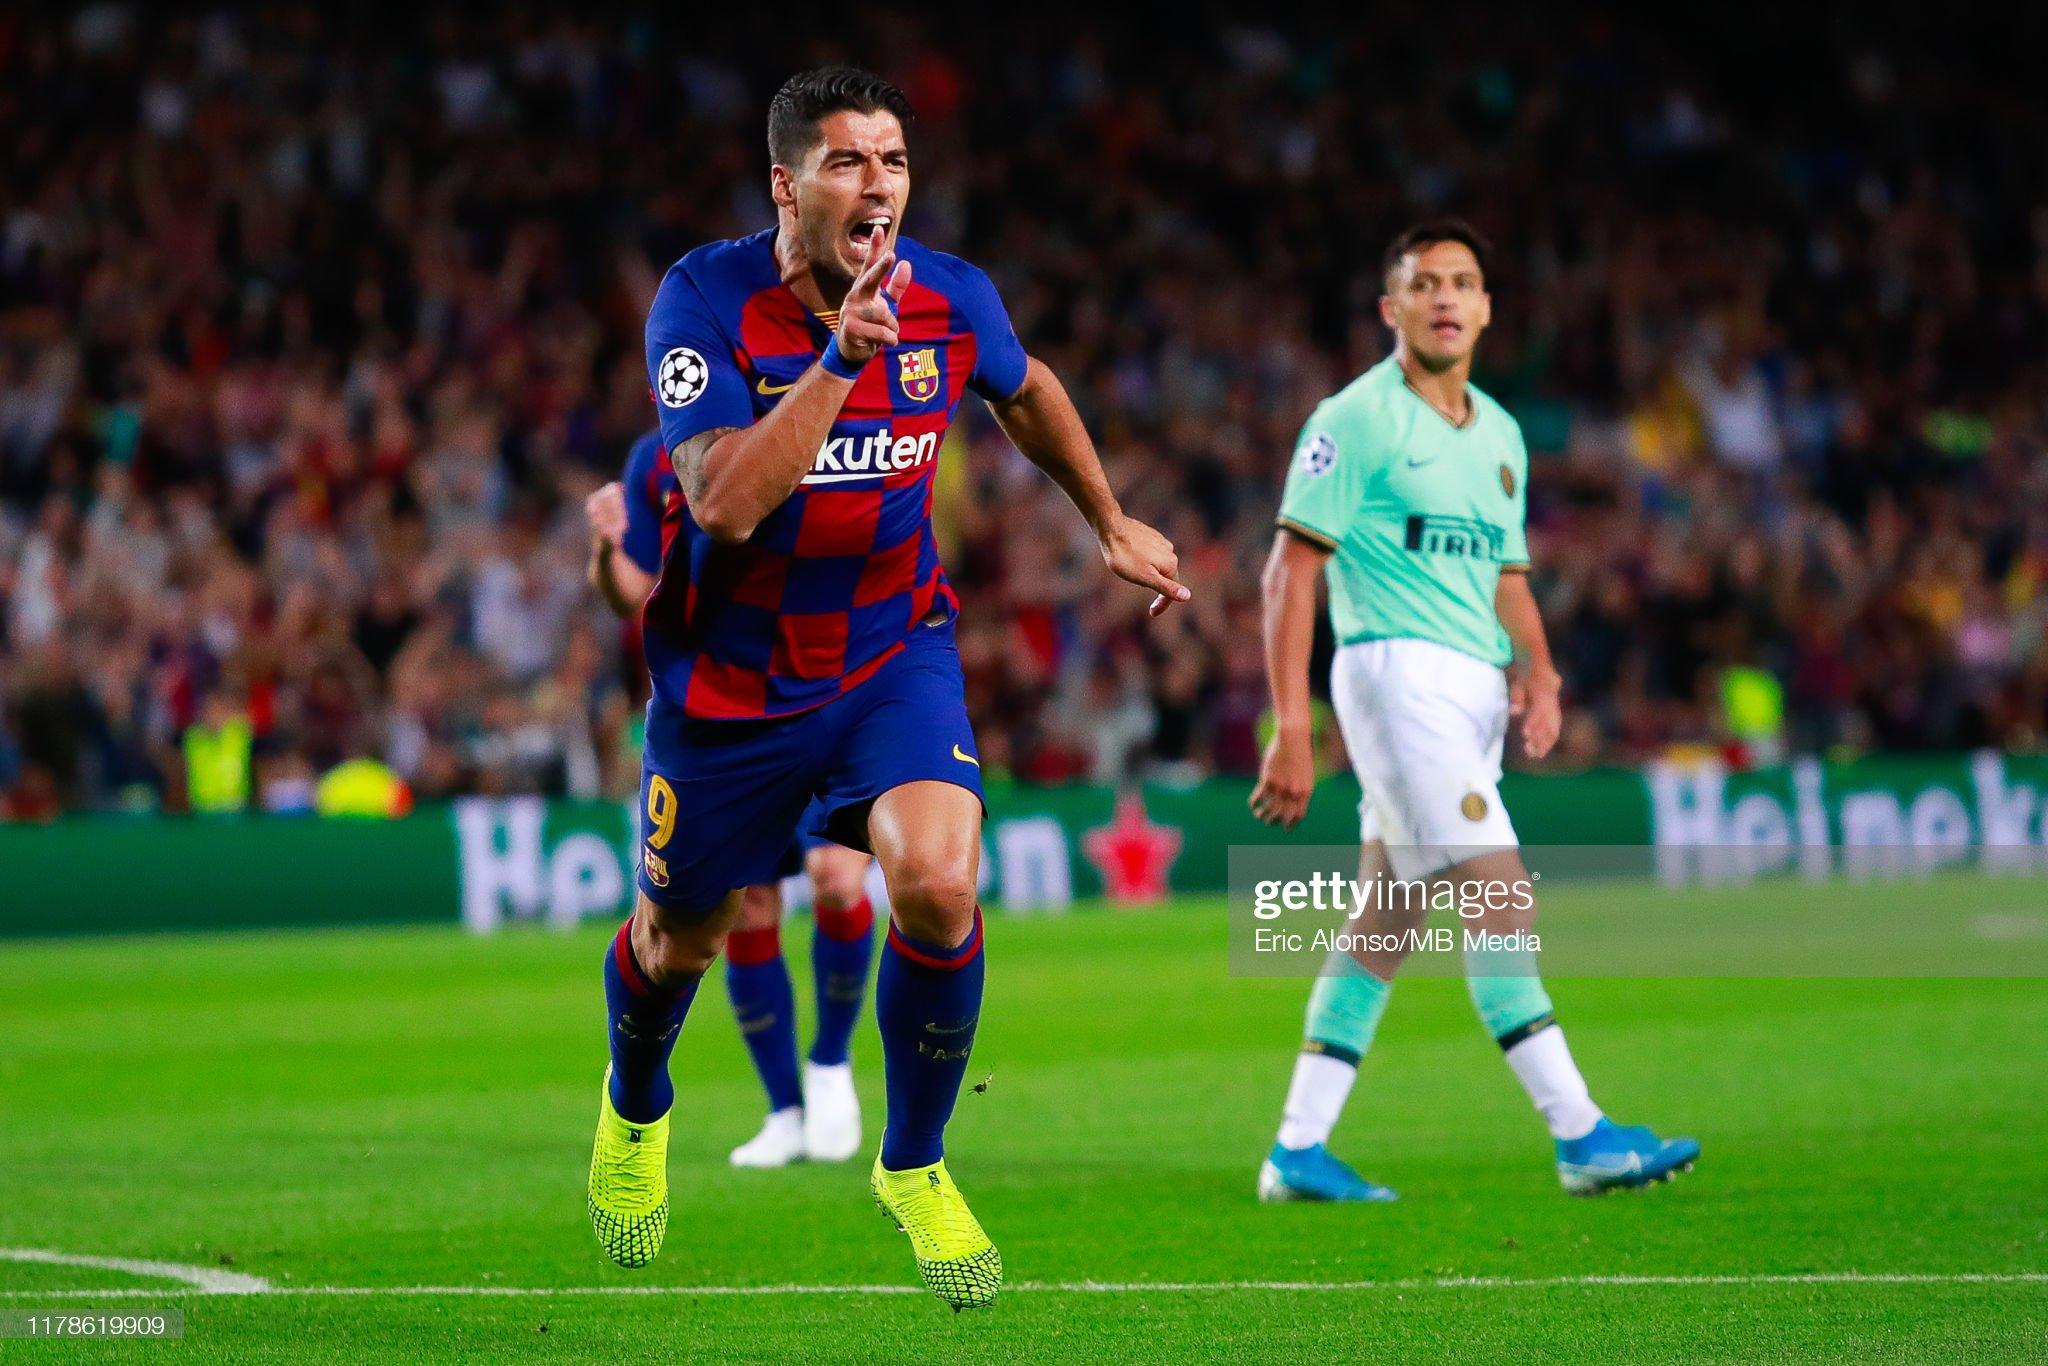 صور مباراة : برشلونة - إنتر 2-1 ( 02-10-2019 )  Luis-suarez-of-fc-barcelona-celebrates-scoring-his-sides-first-goal-picture-id1178619909?s=2048x2048